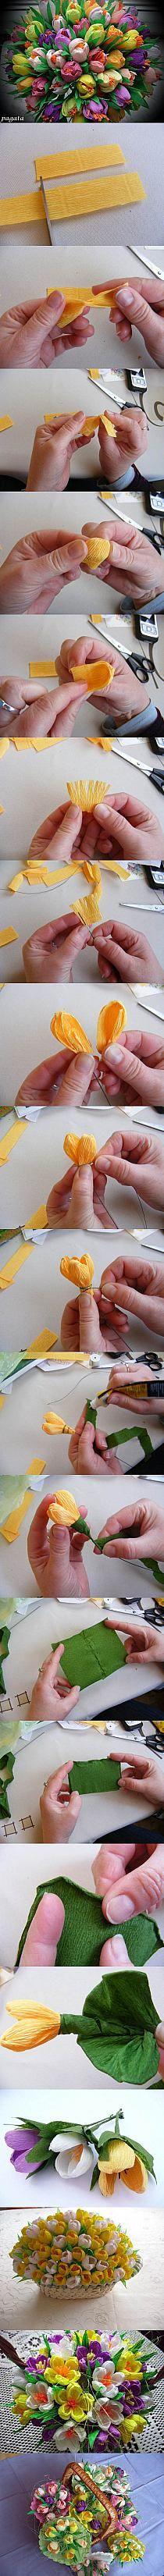 DIY Embroidery Ribbon Flower DIY Projects | UsefulDIY.c… na Stylowi.pl